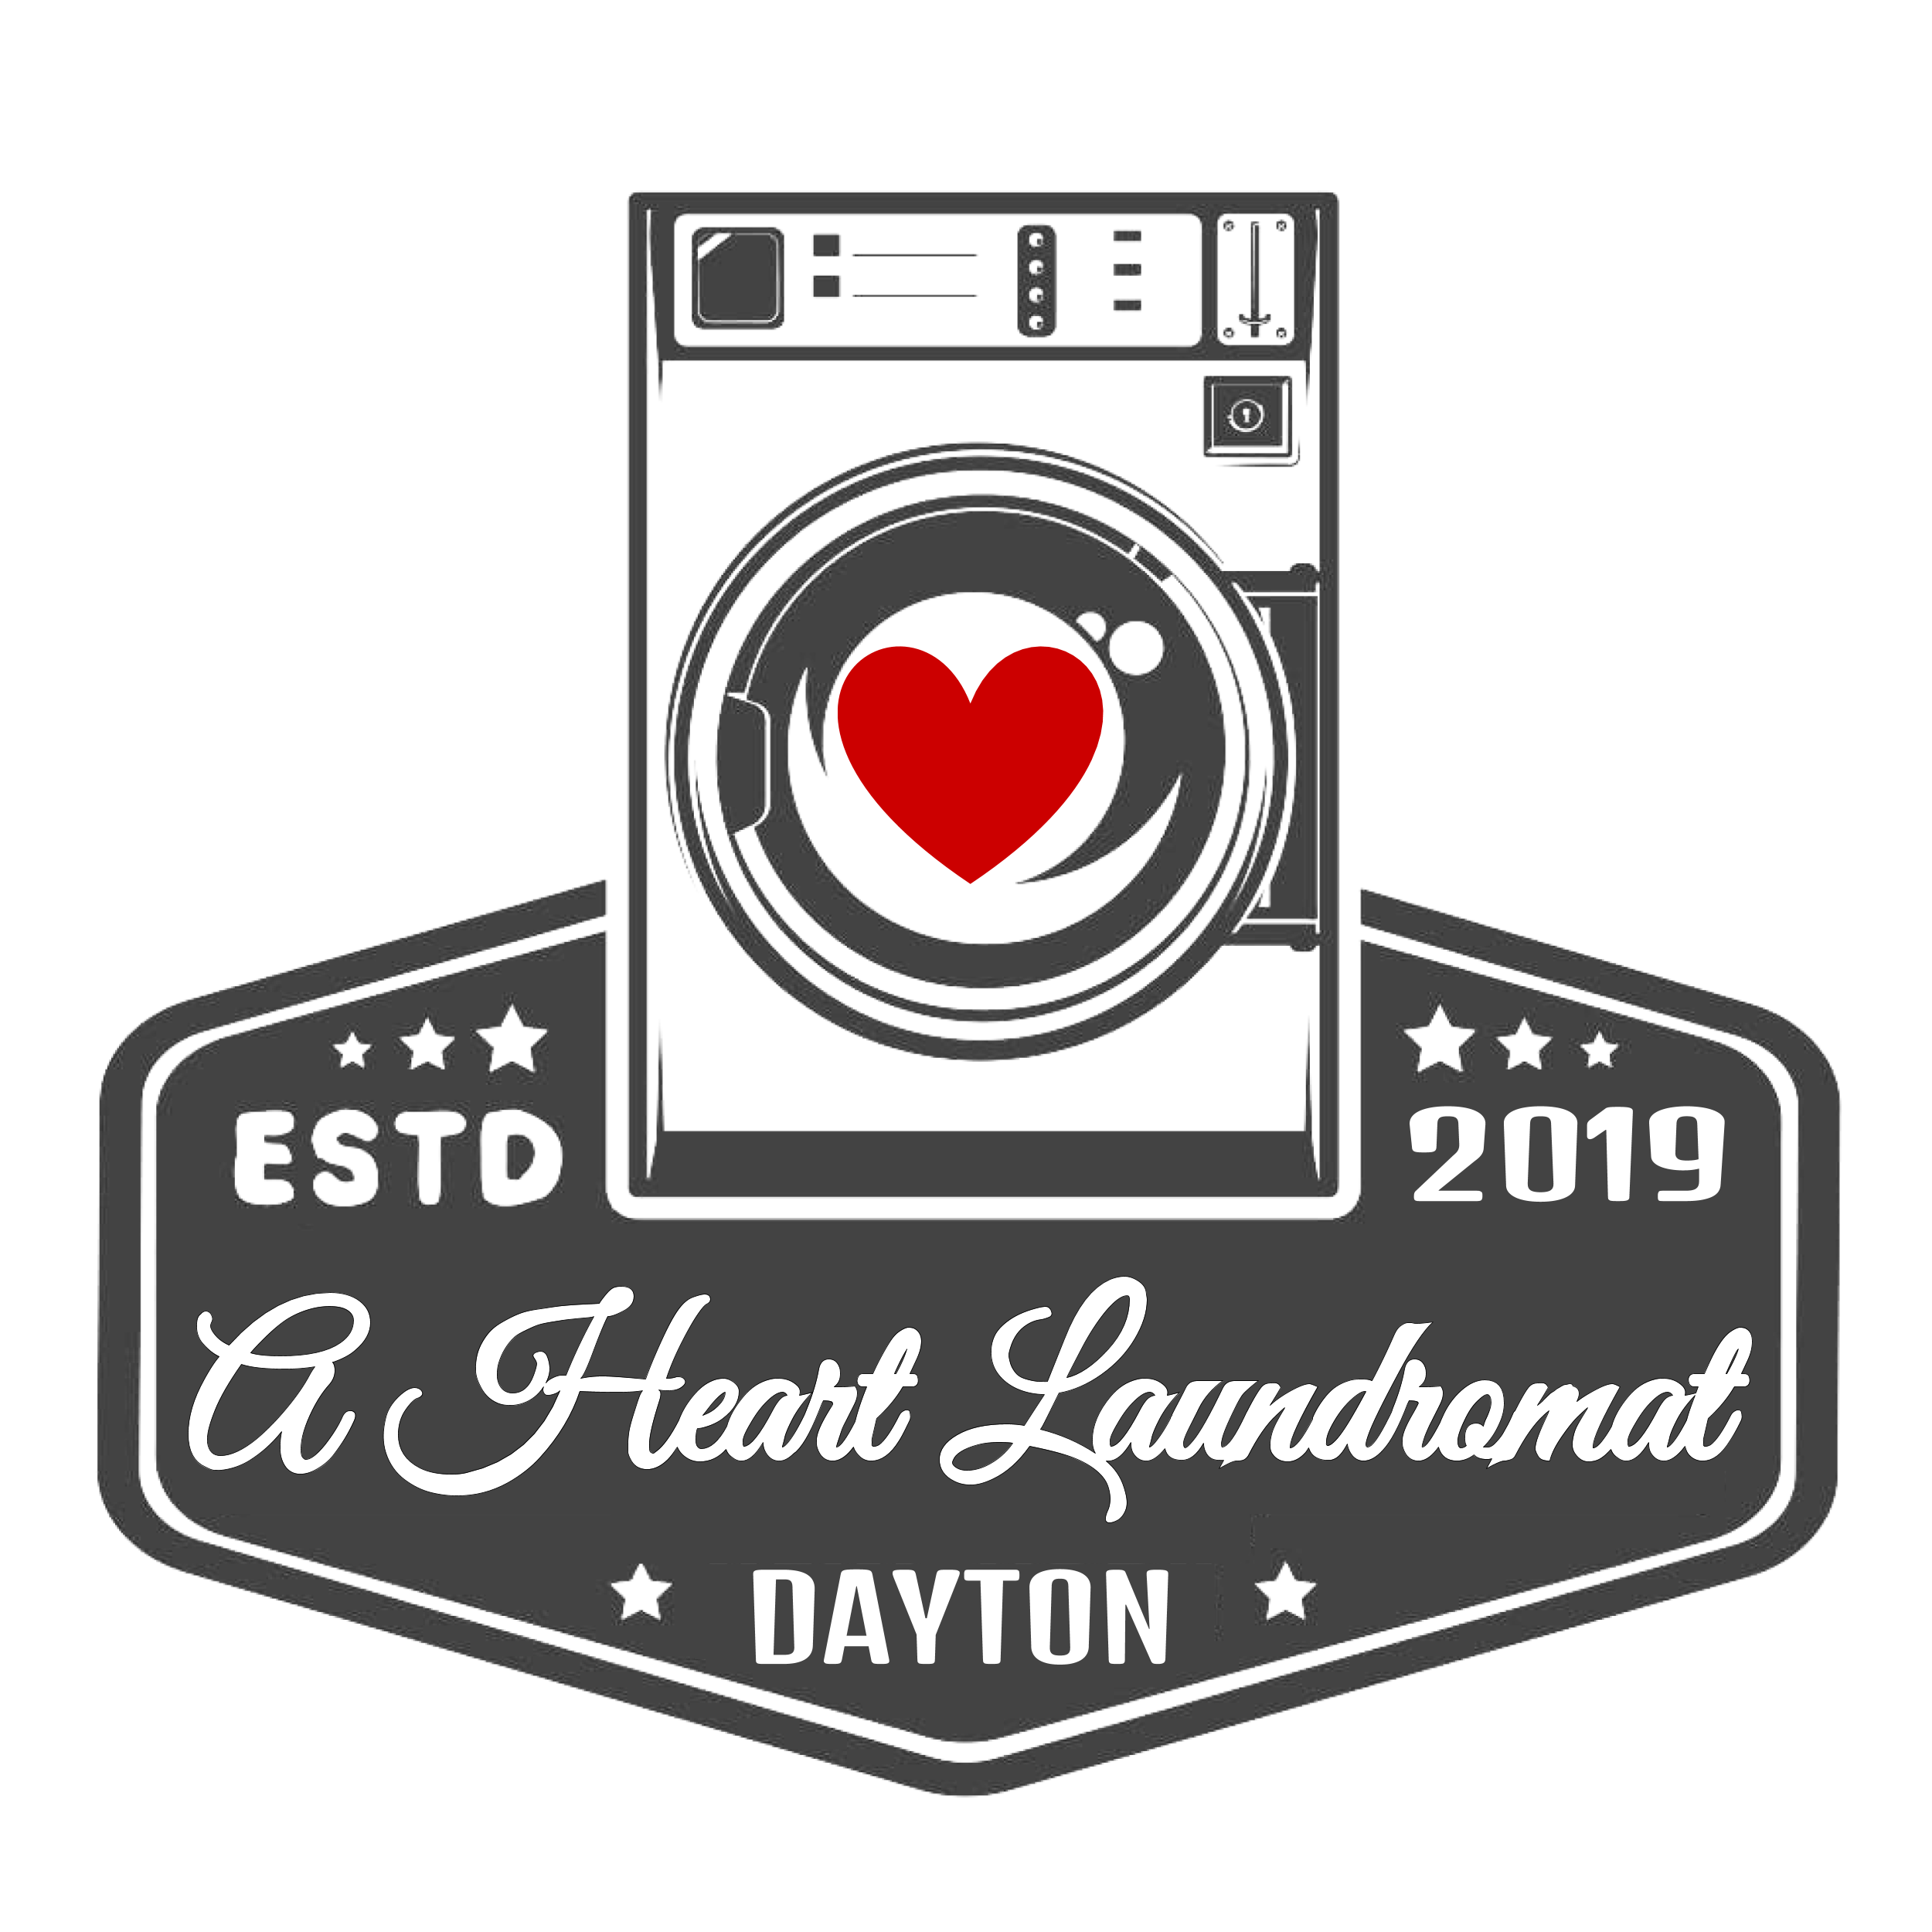 A Heart Laundromat